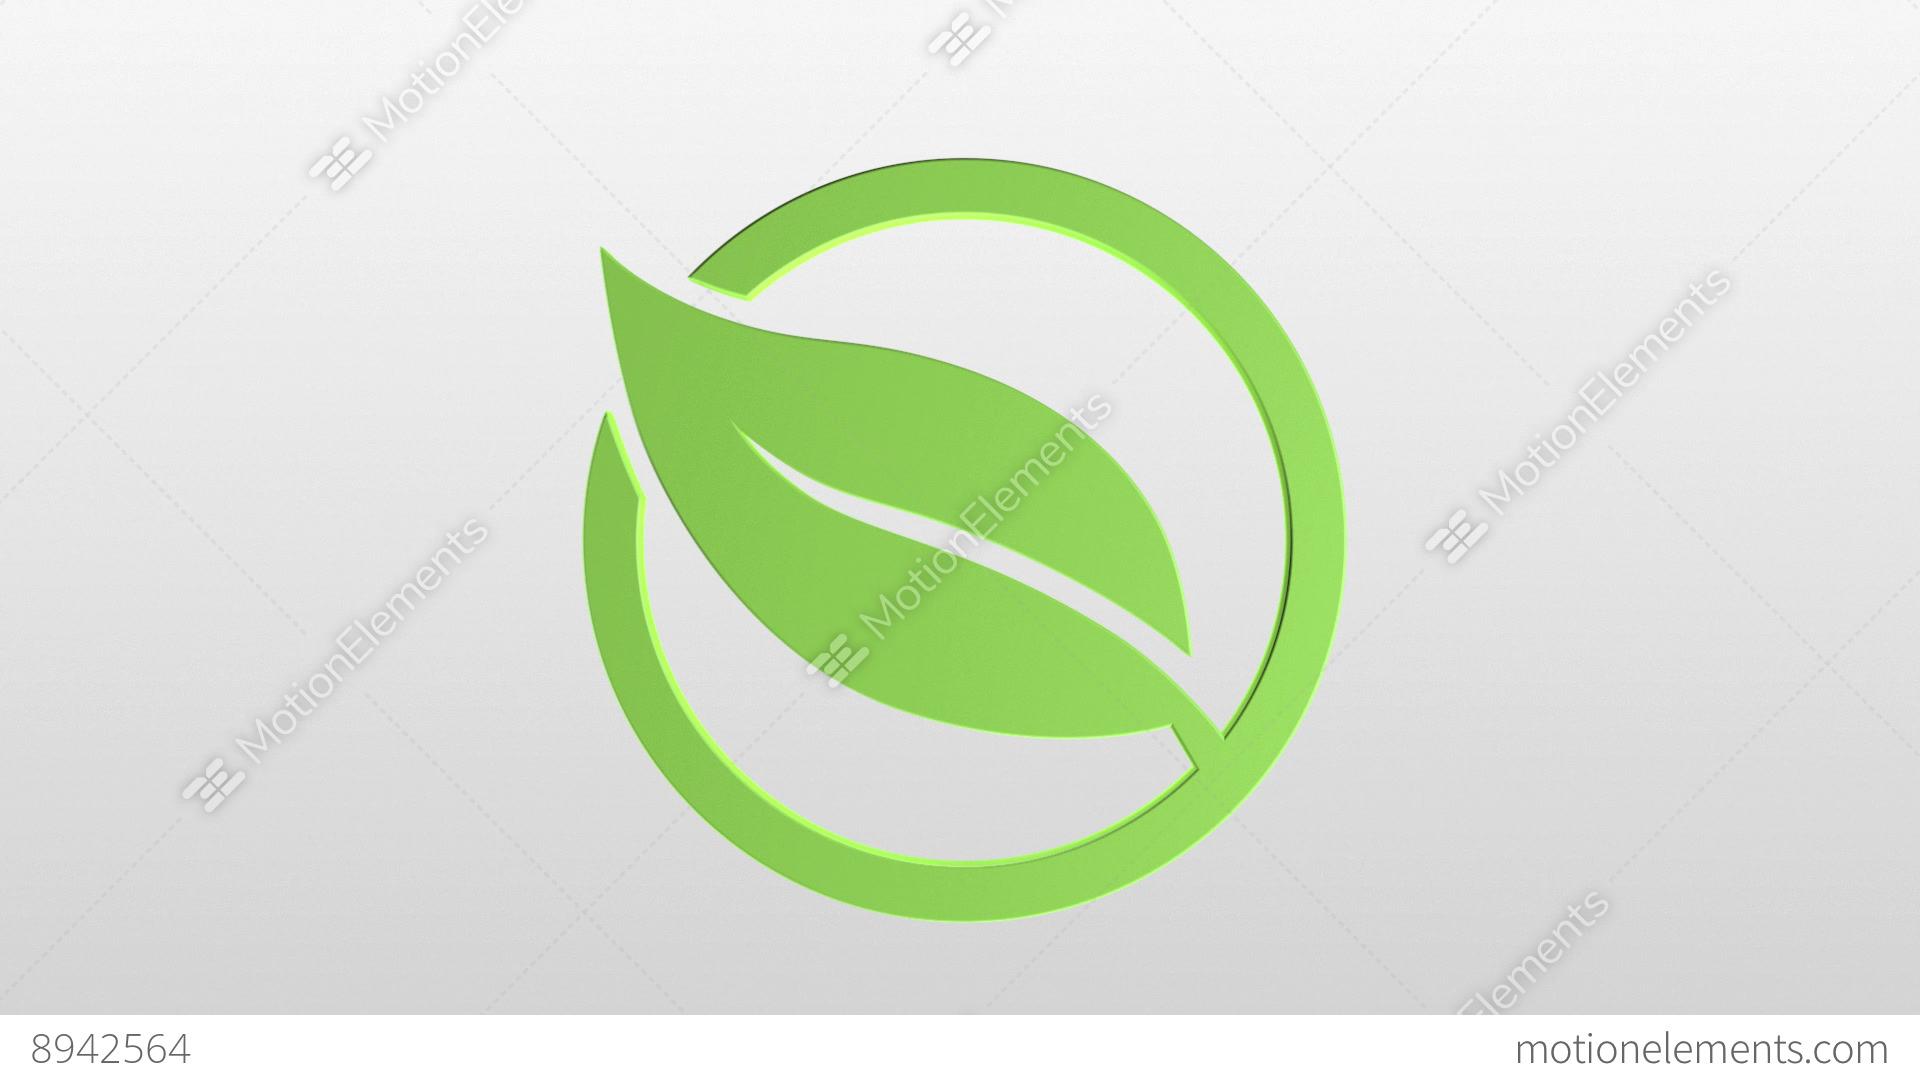 Скачать Eco Technology Flat Icons: Eco Icons Stock Animation